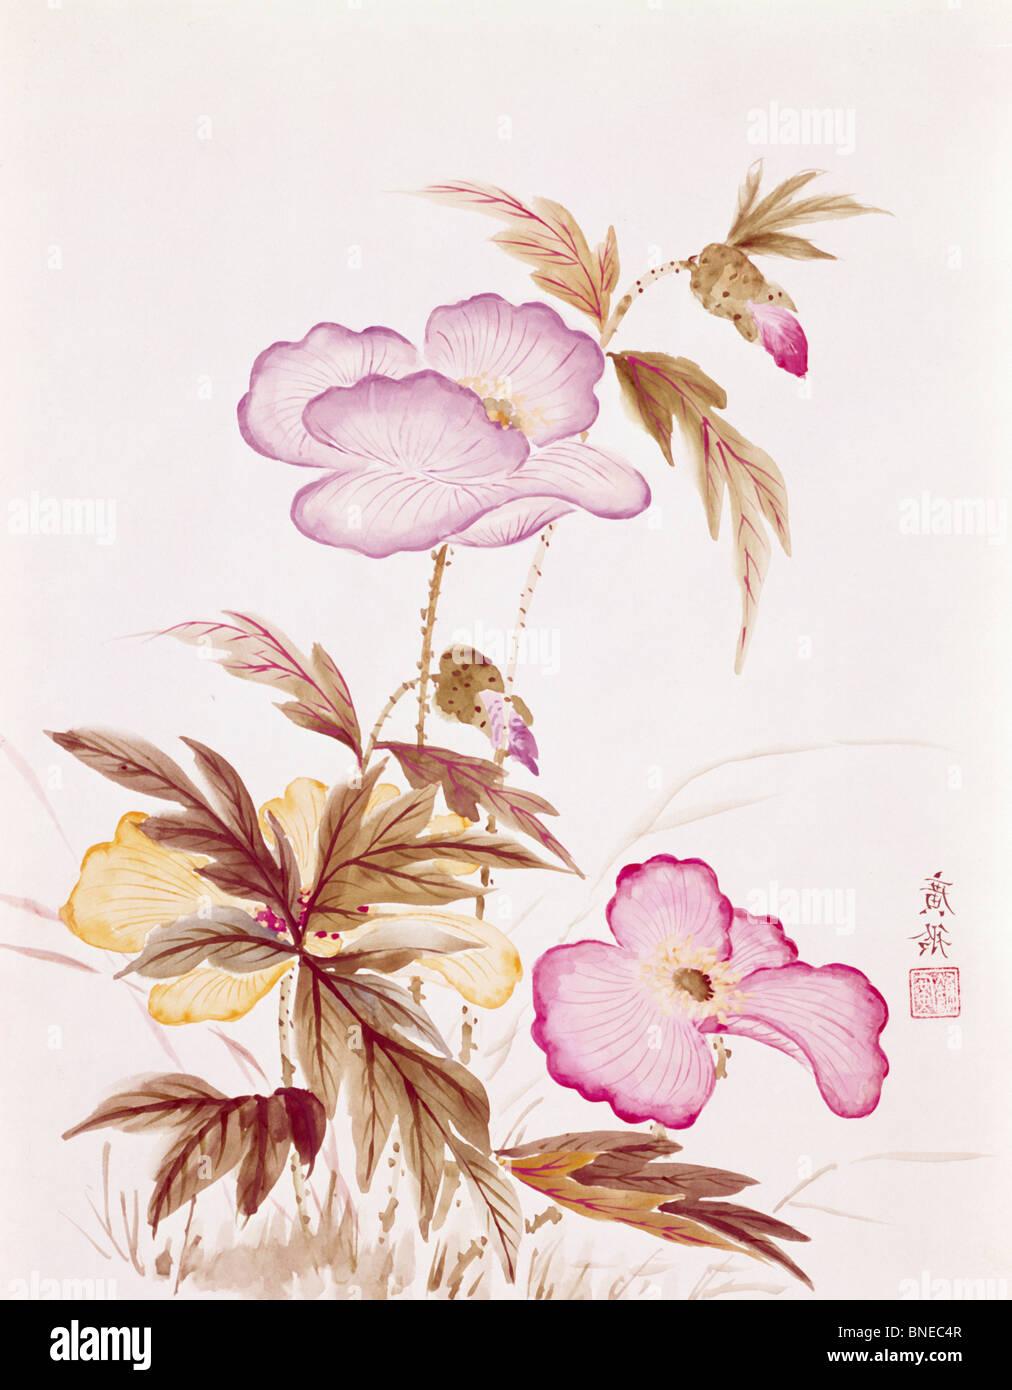 Amor del amor rechazado por Kwang-Ling Ku, Siglo XX Imagen De Stock